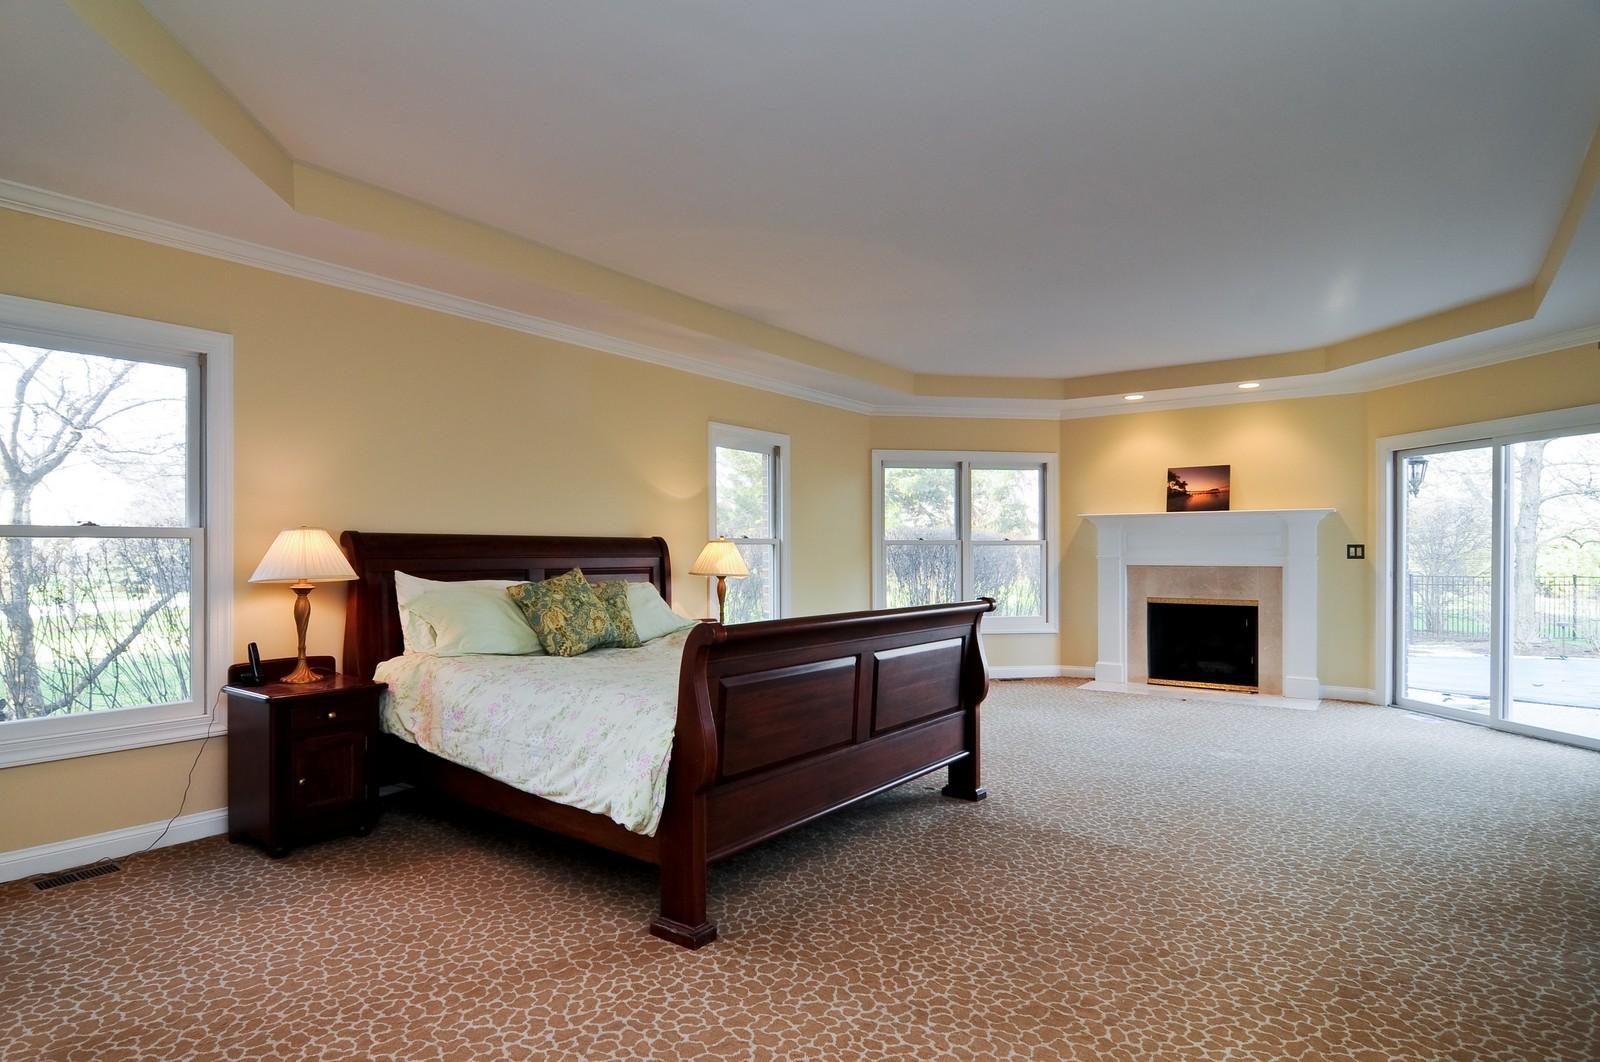 Real Estate Photography - 2091 Trenton, Libertyville, IL, 60048 - Master Bedroom